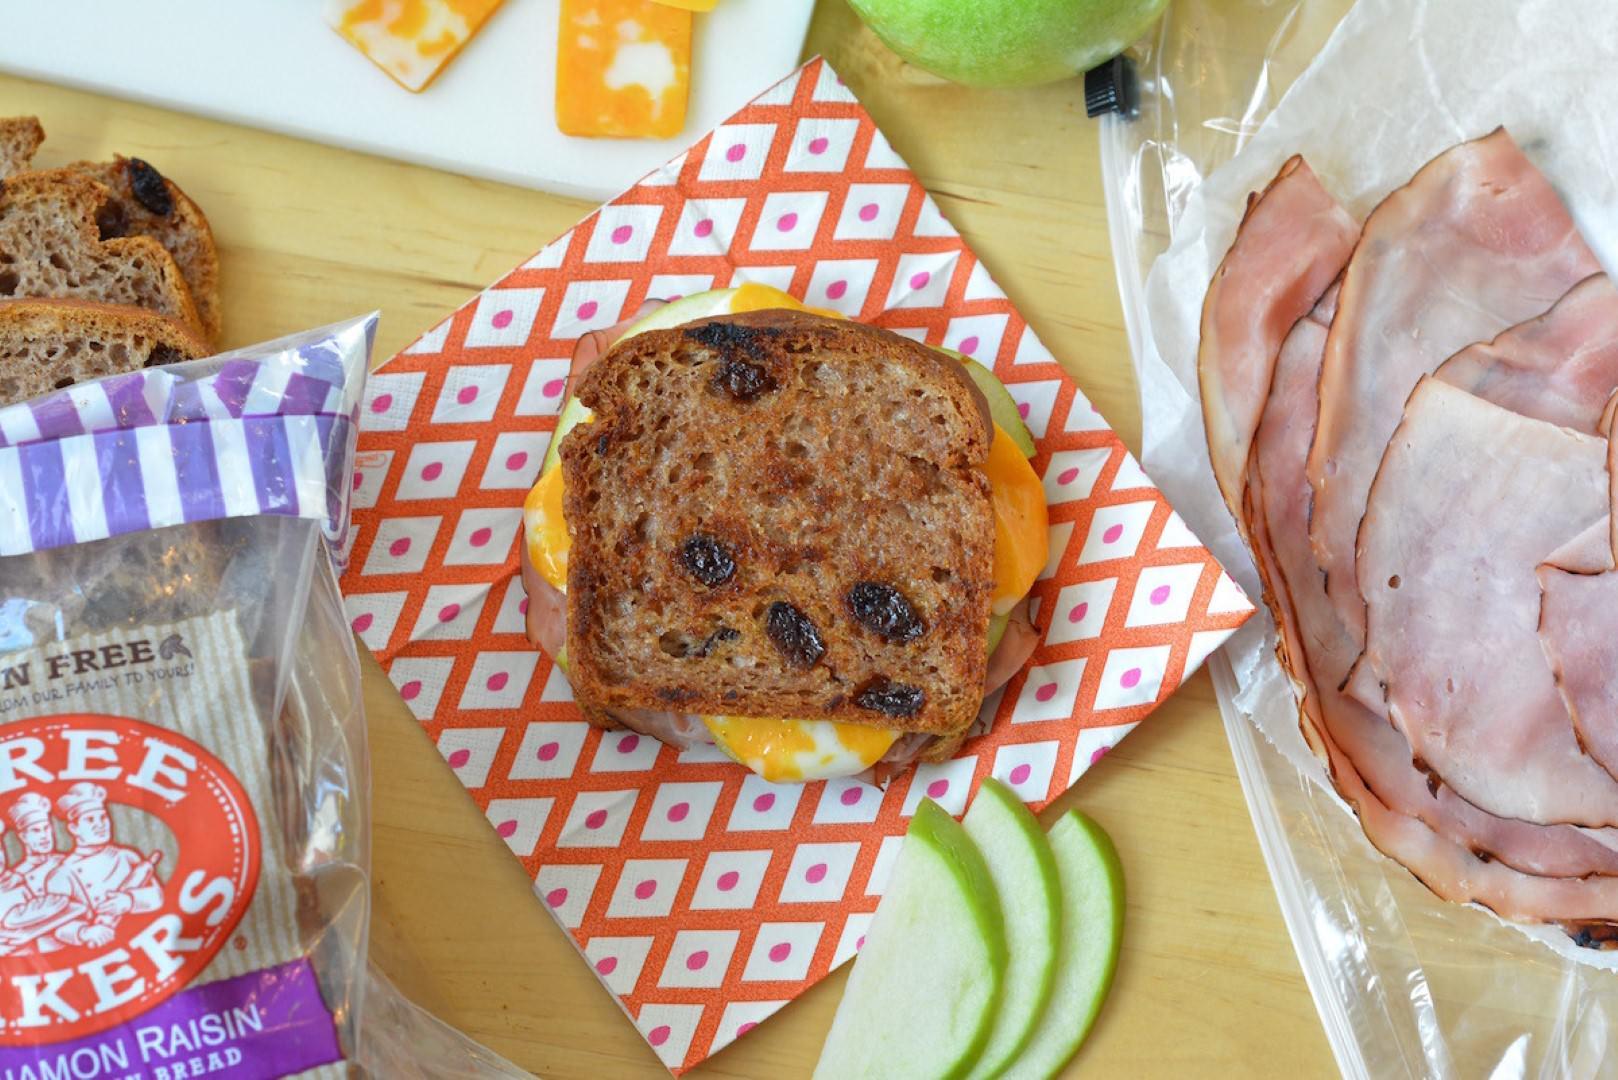 Grilled Ham, Apple & Raisin Bread Sandwich 4